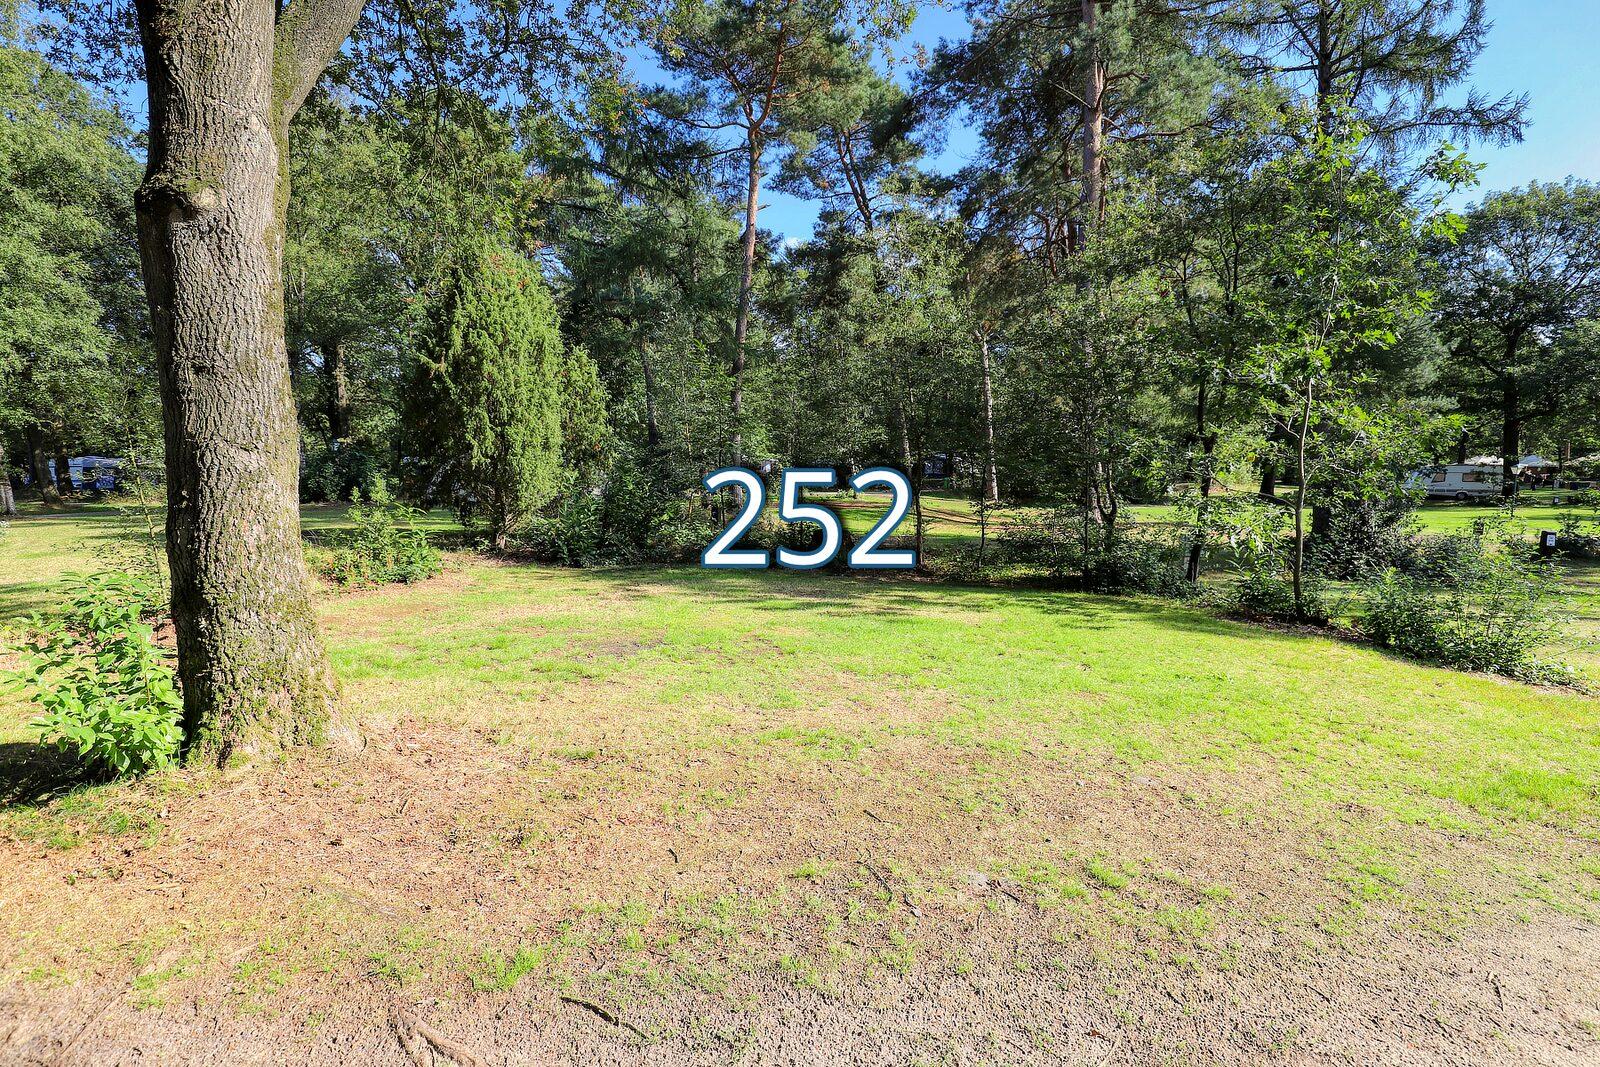 bosrand 252